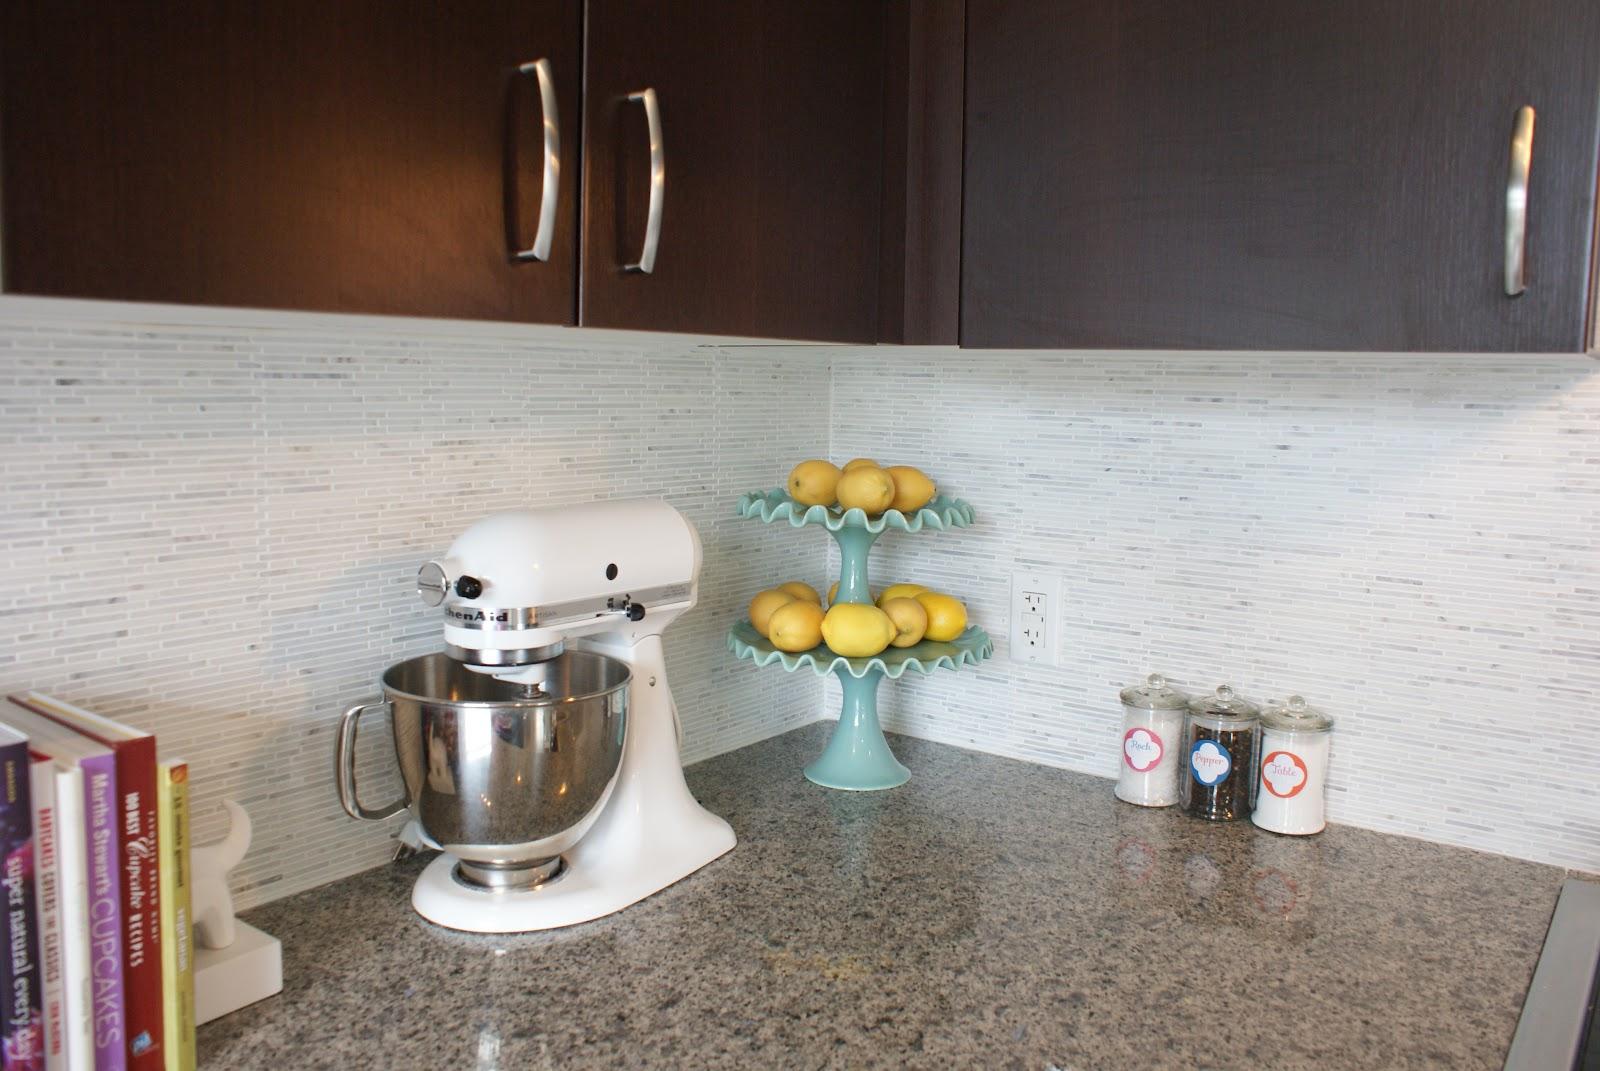 wooden kitchen cabinet with carrar marble backsplash